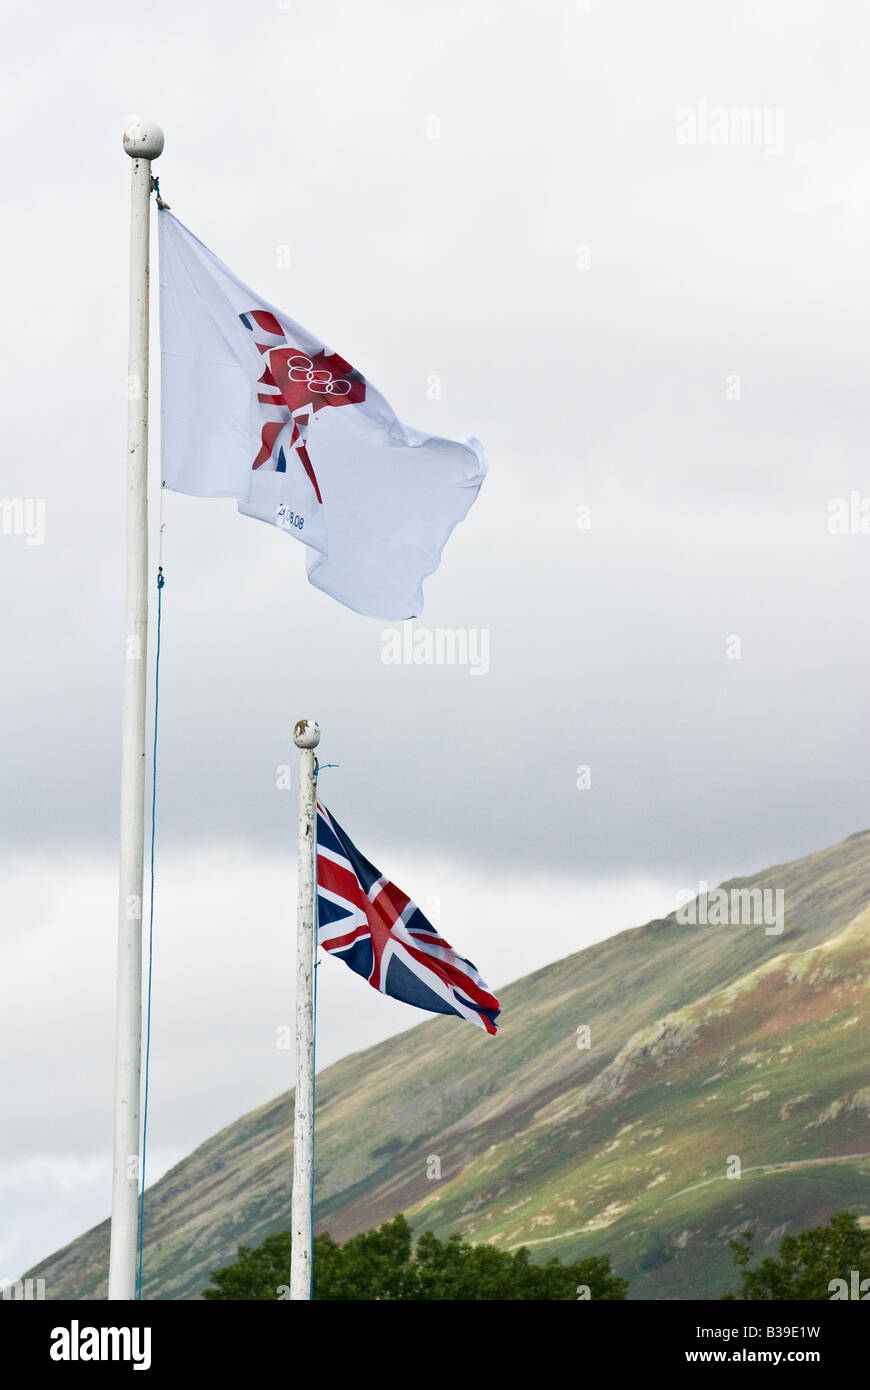 London 2012 Olympic flag and Union Jack - Stock Image